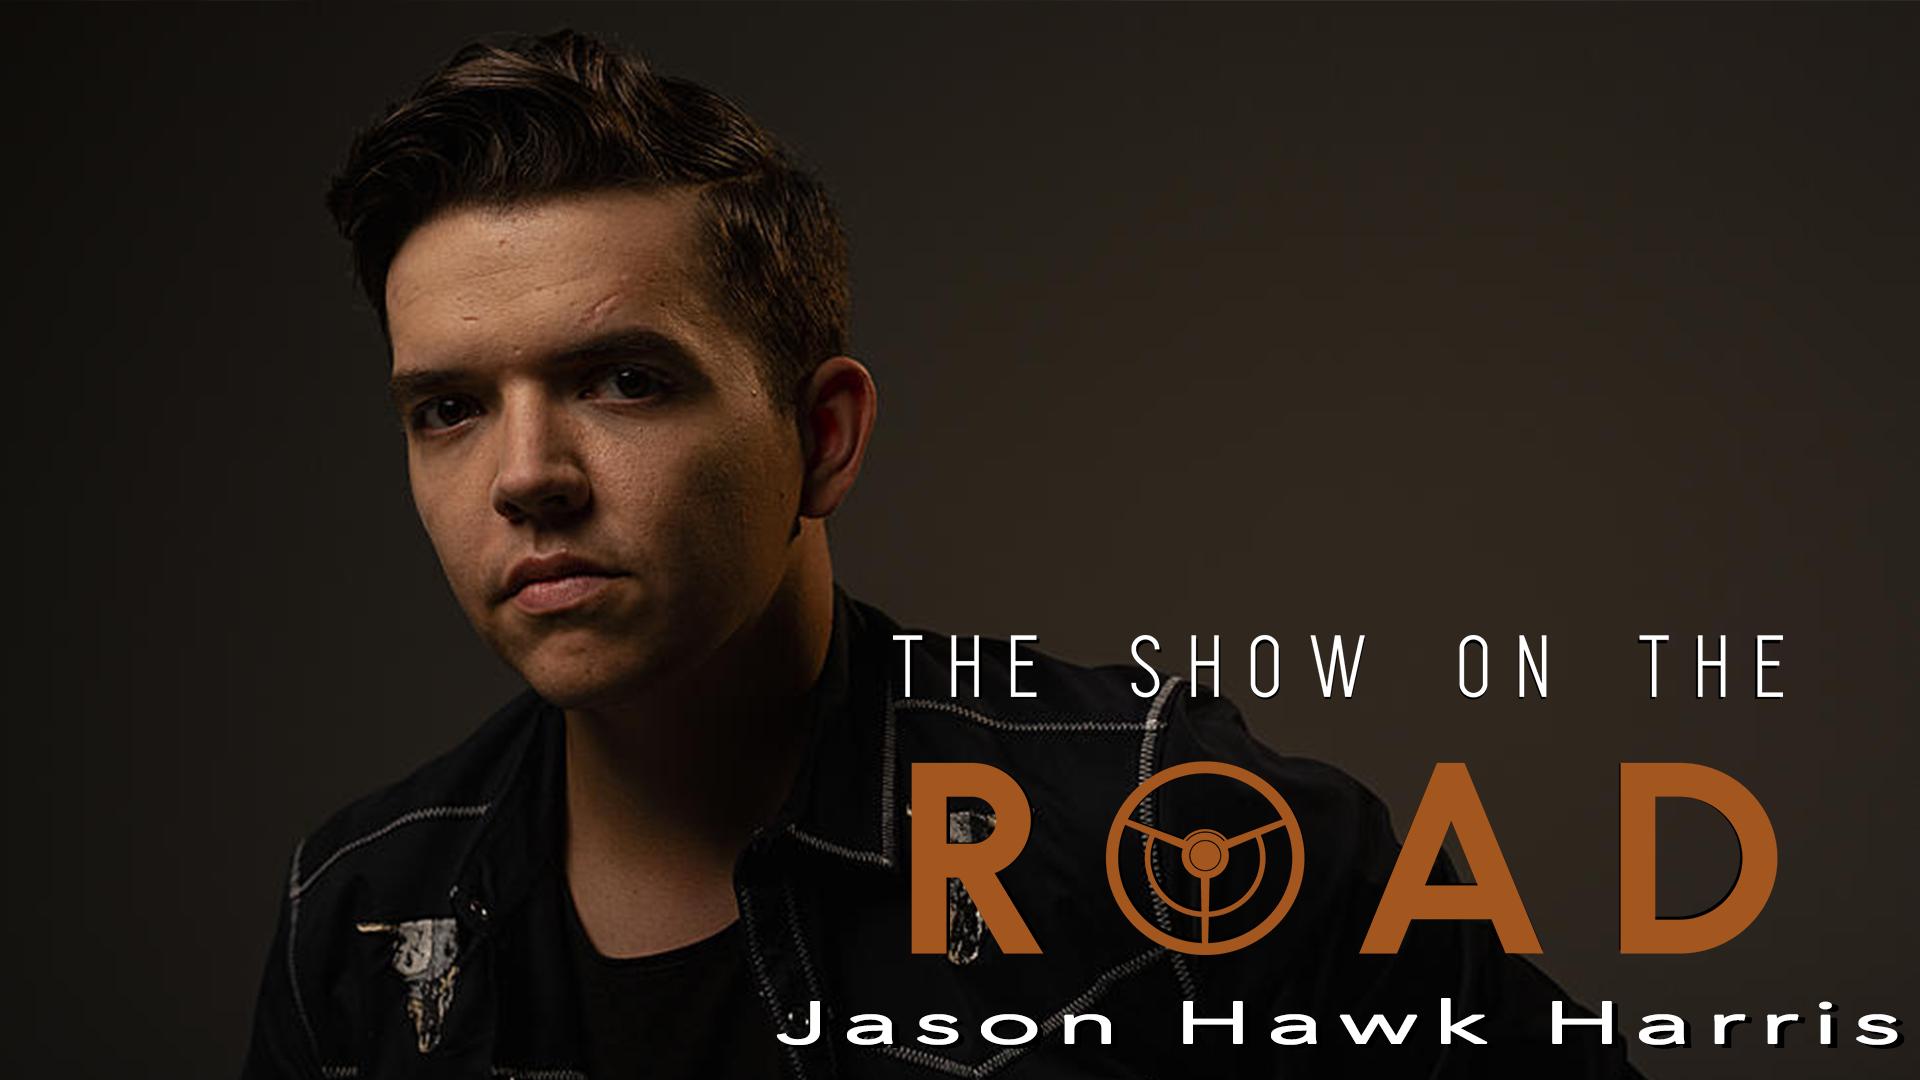 The Show On The Road – Jason Hawk Harris